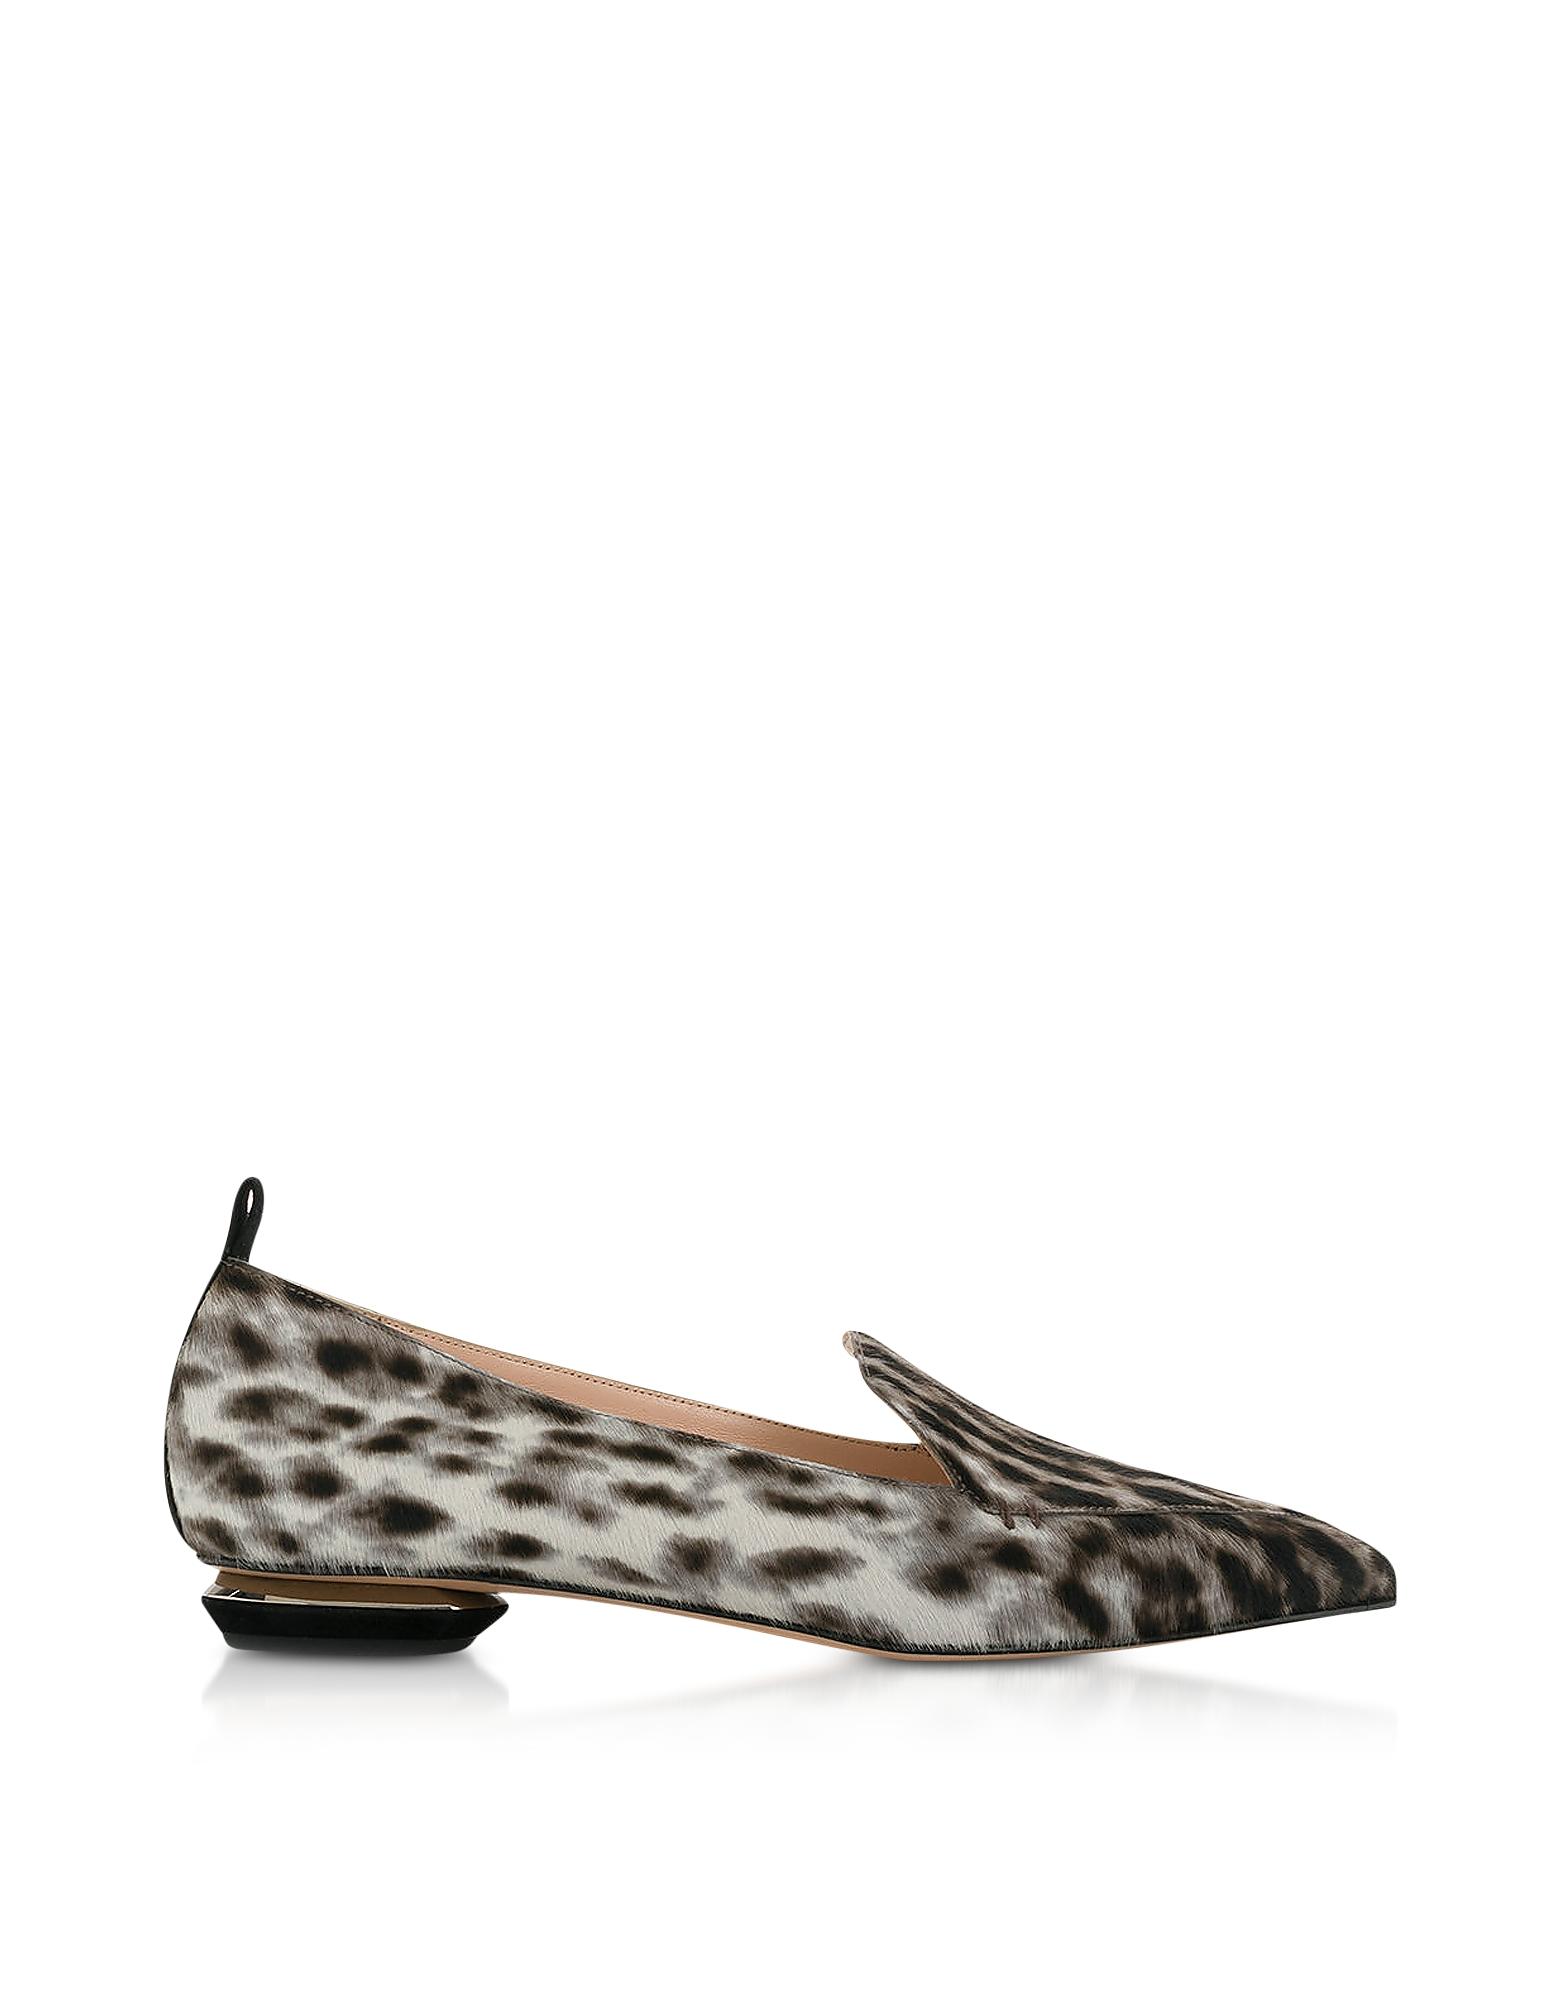 Nicholas Kirkwood Shoes, Leopard Print Beya Loafers